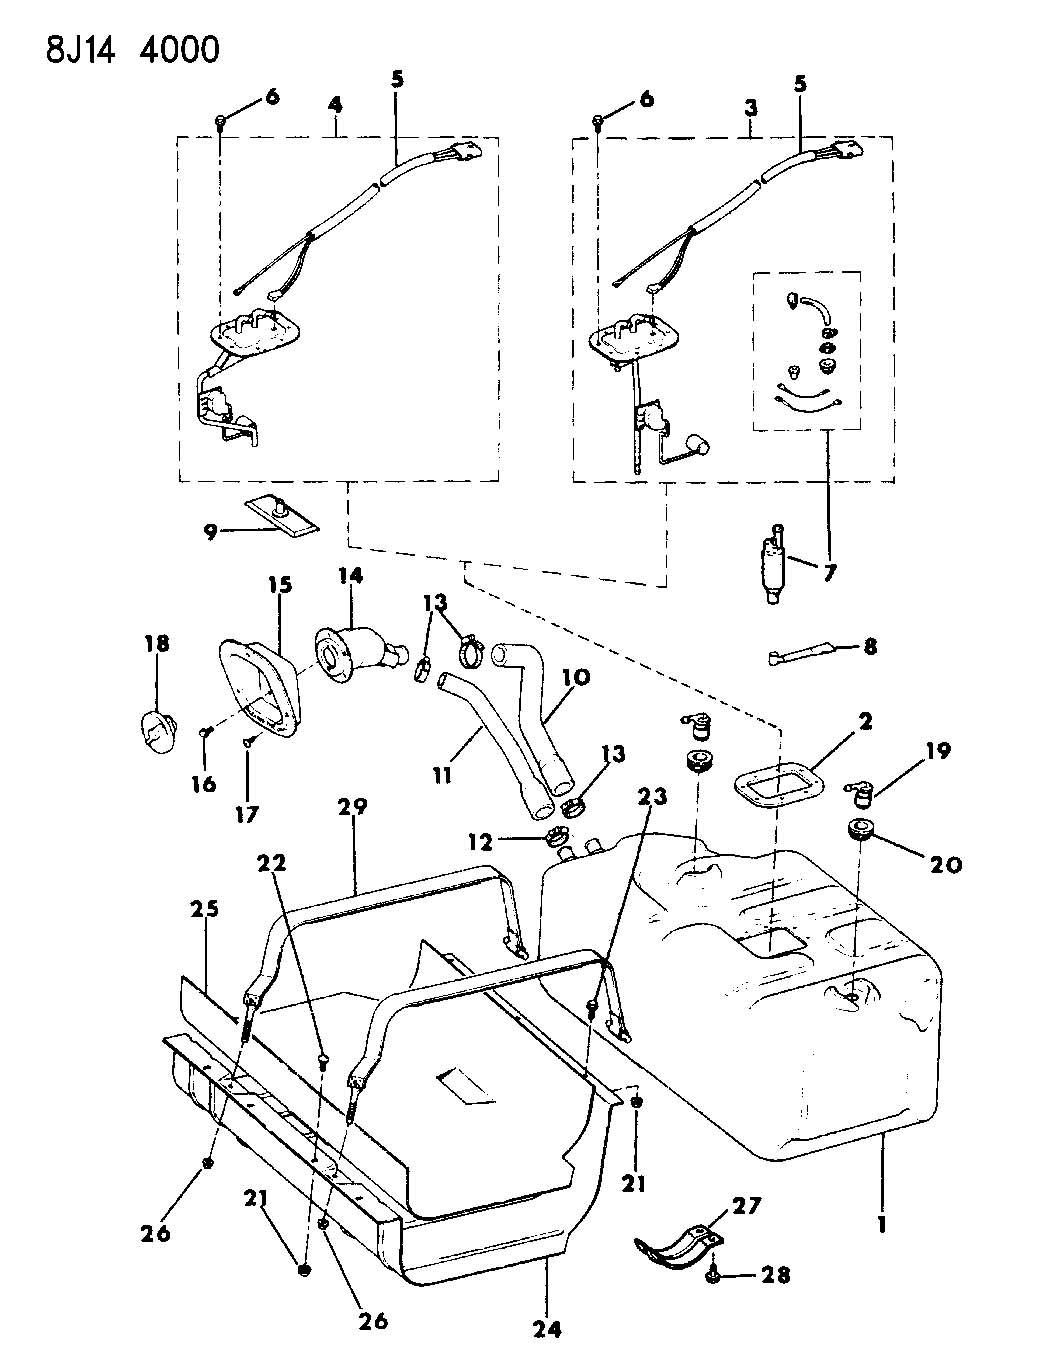 Gas tank vacuum leak jeep wrangler rh wrangler jeep cj7 fuel line diagram jeep